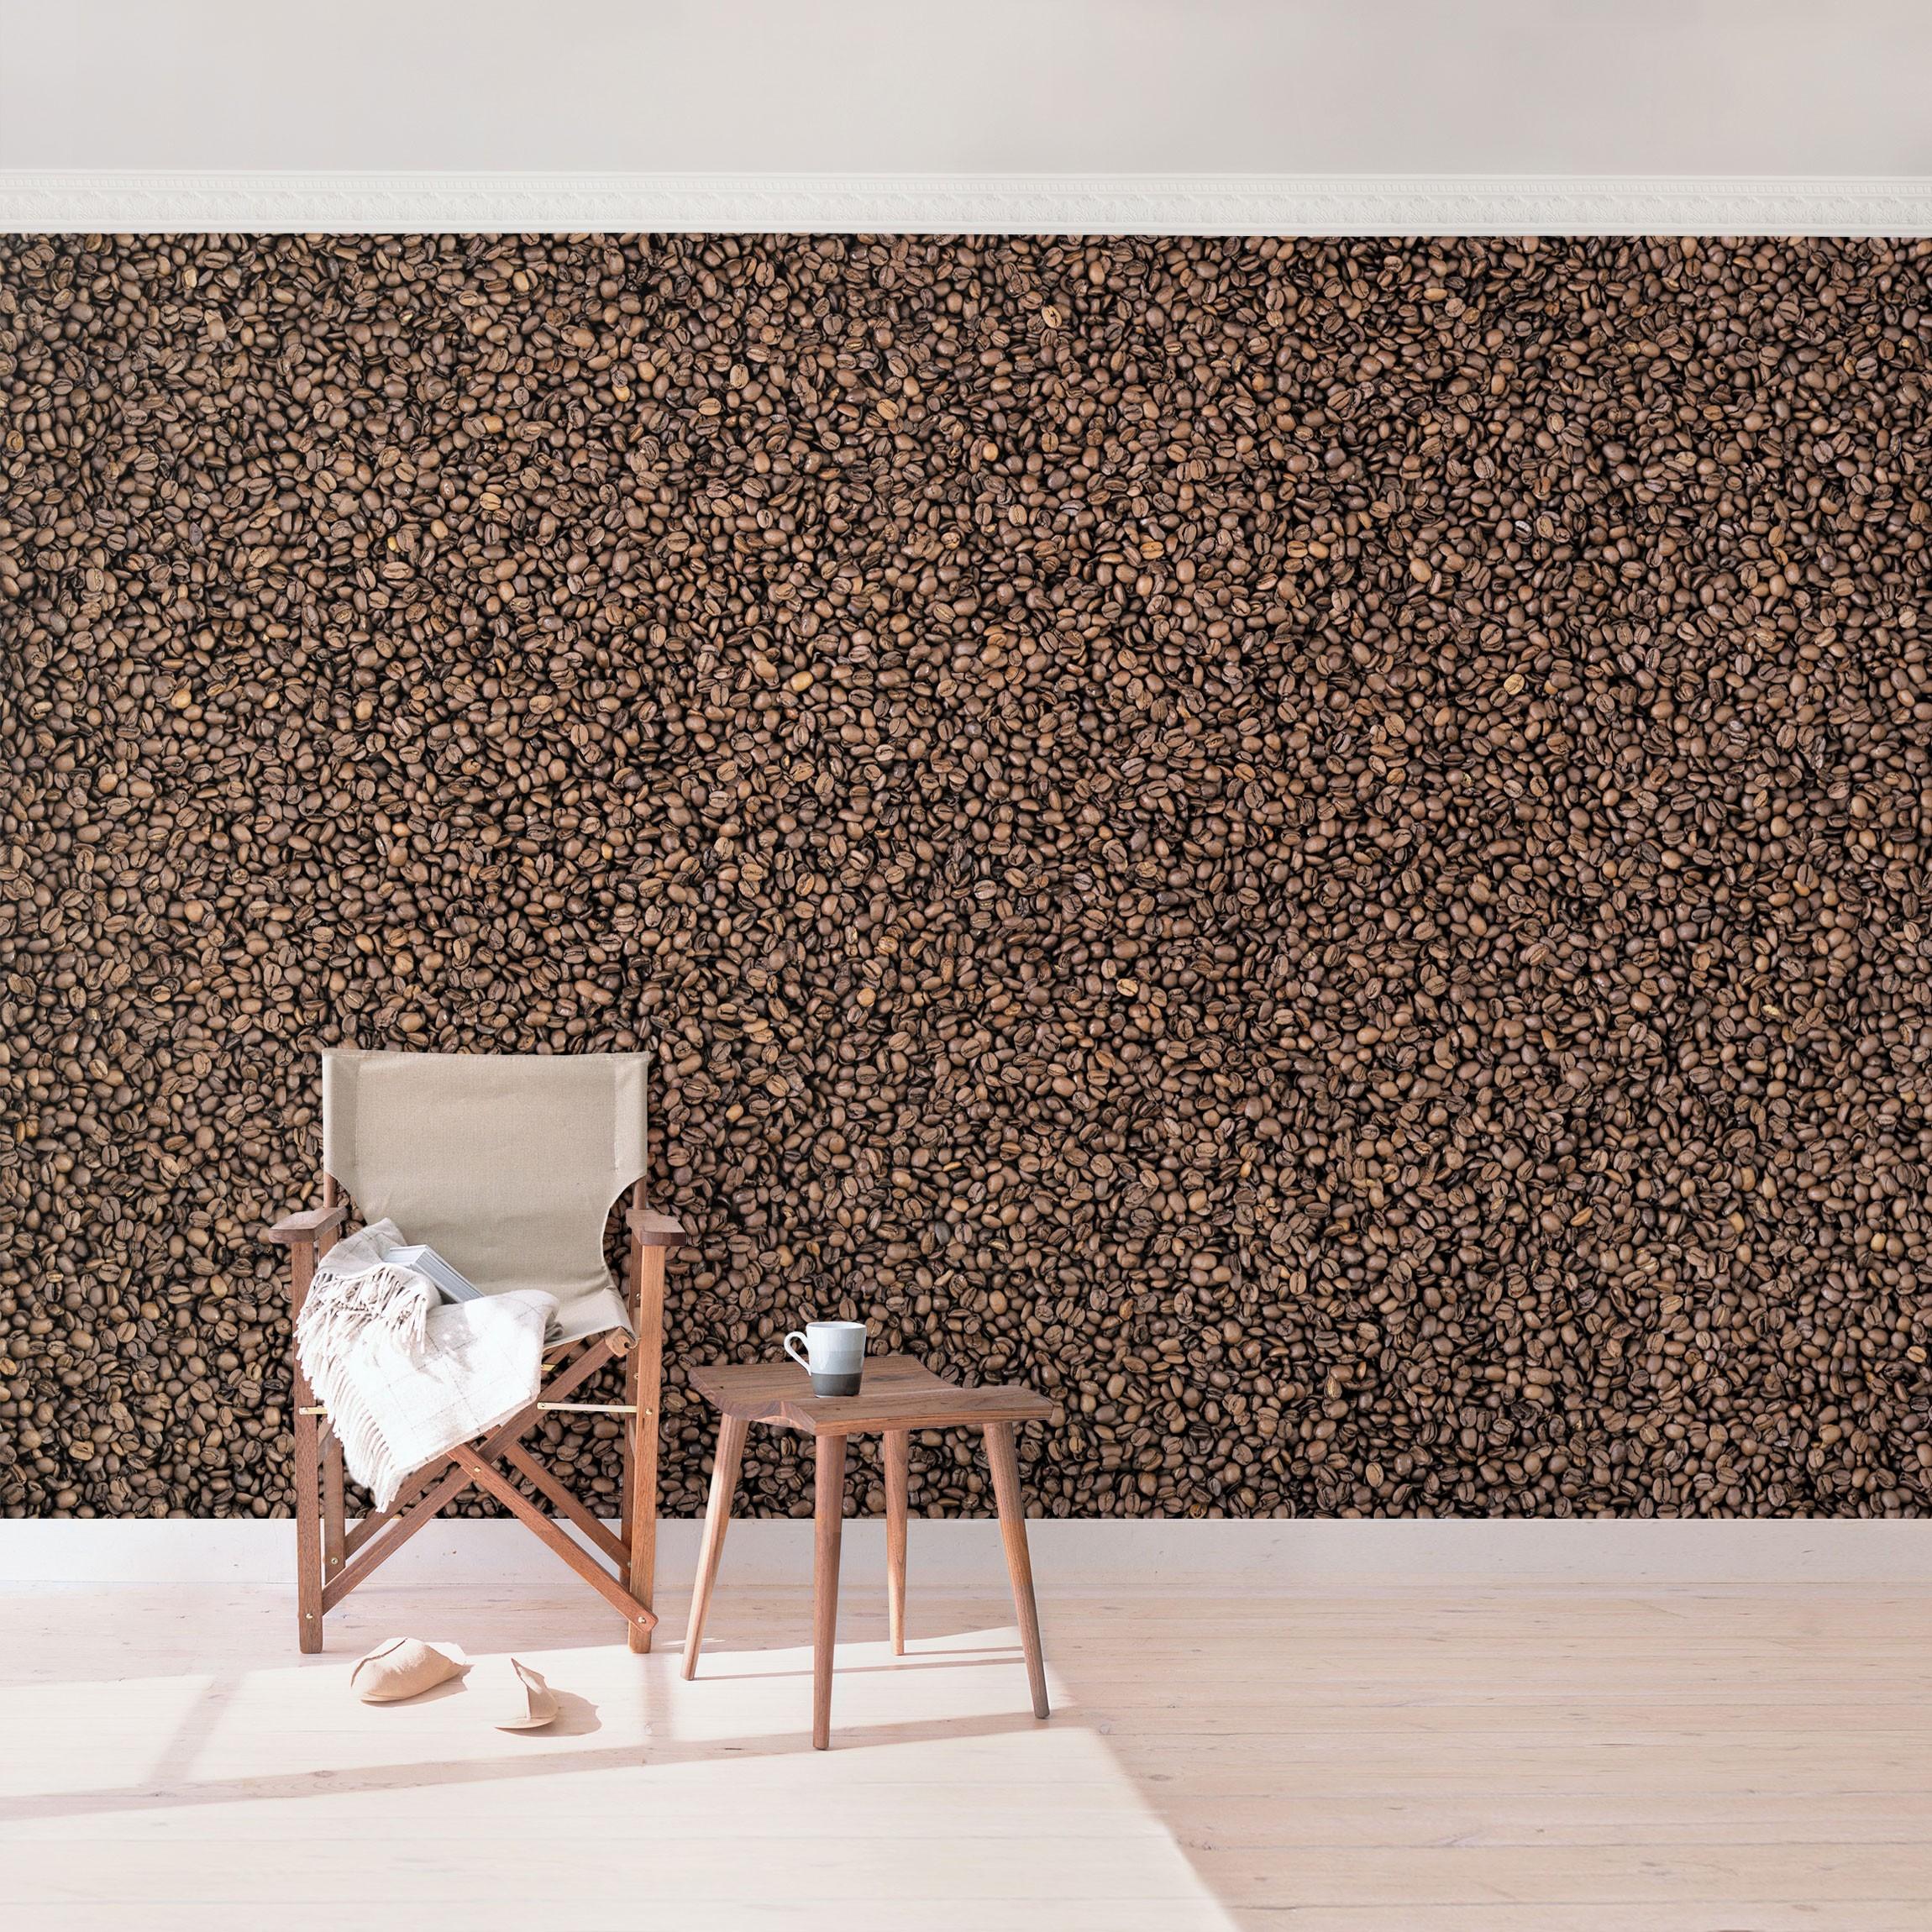 selbstklebende tapete fototapete sea of coffee k chentapeten. Black Bedroom Furniture Sets. Home Design Ideas